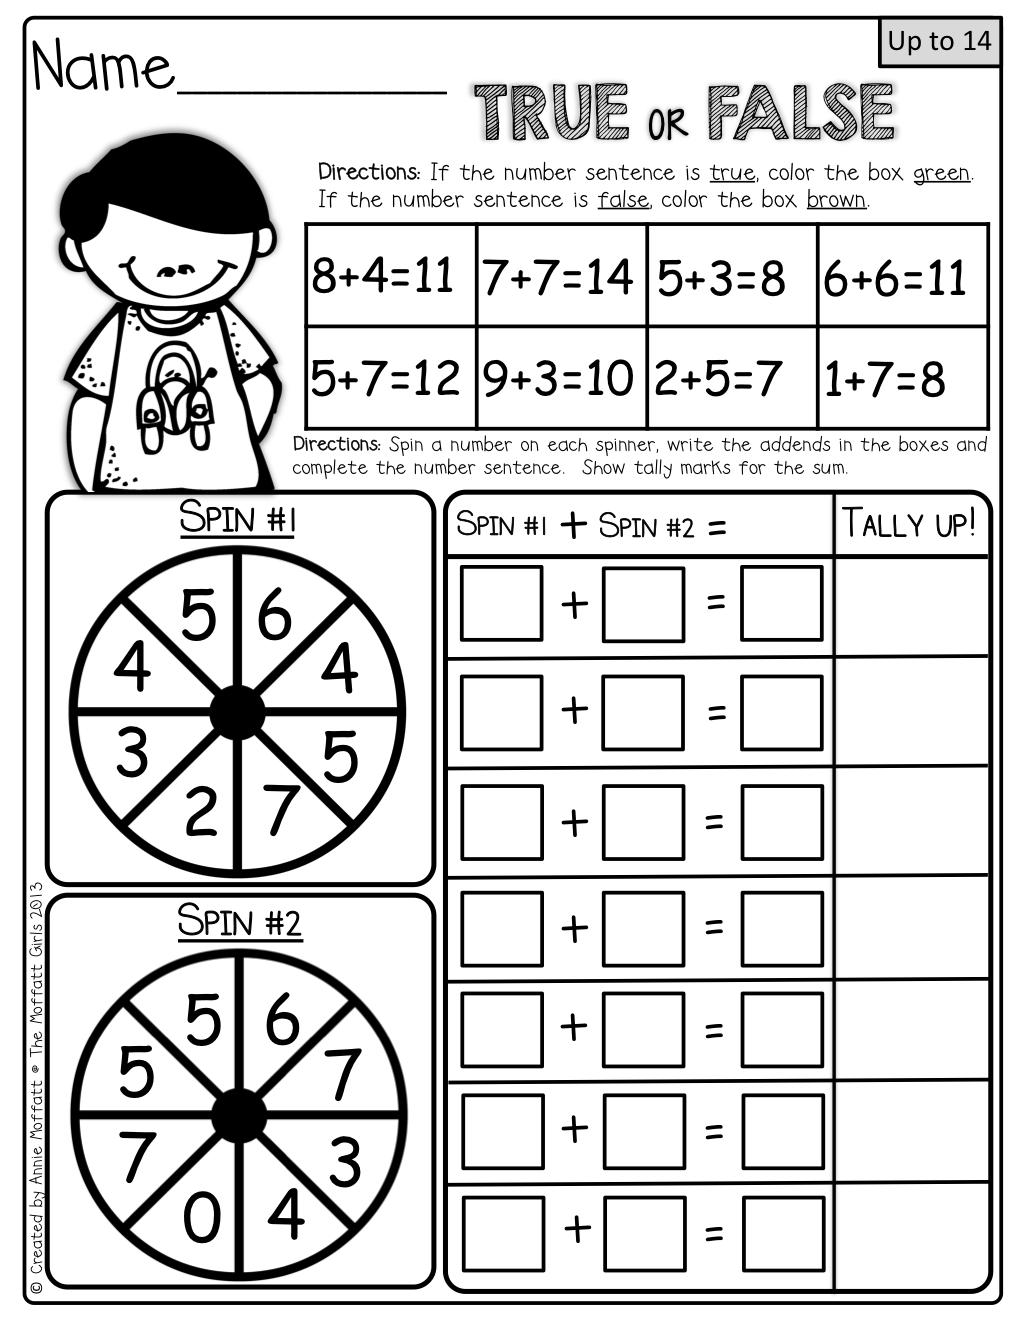 Interactive Math Fun Activities To Help Master Simple